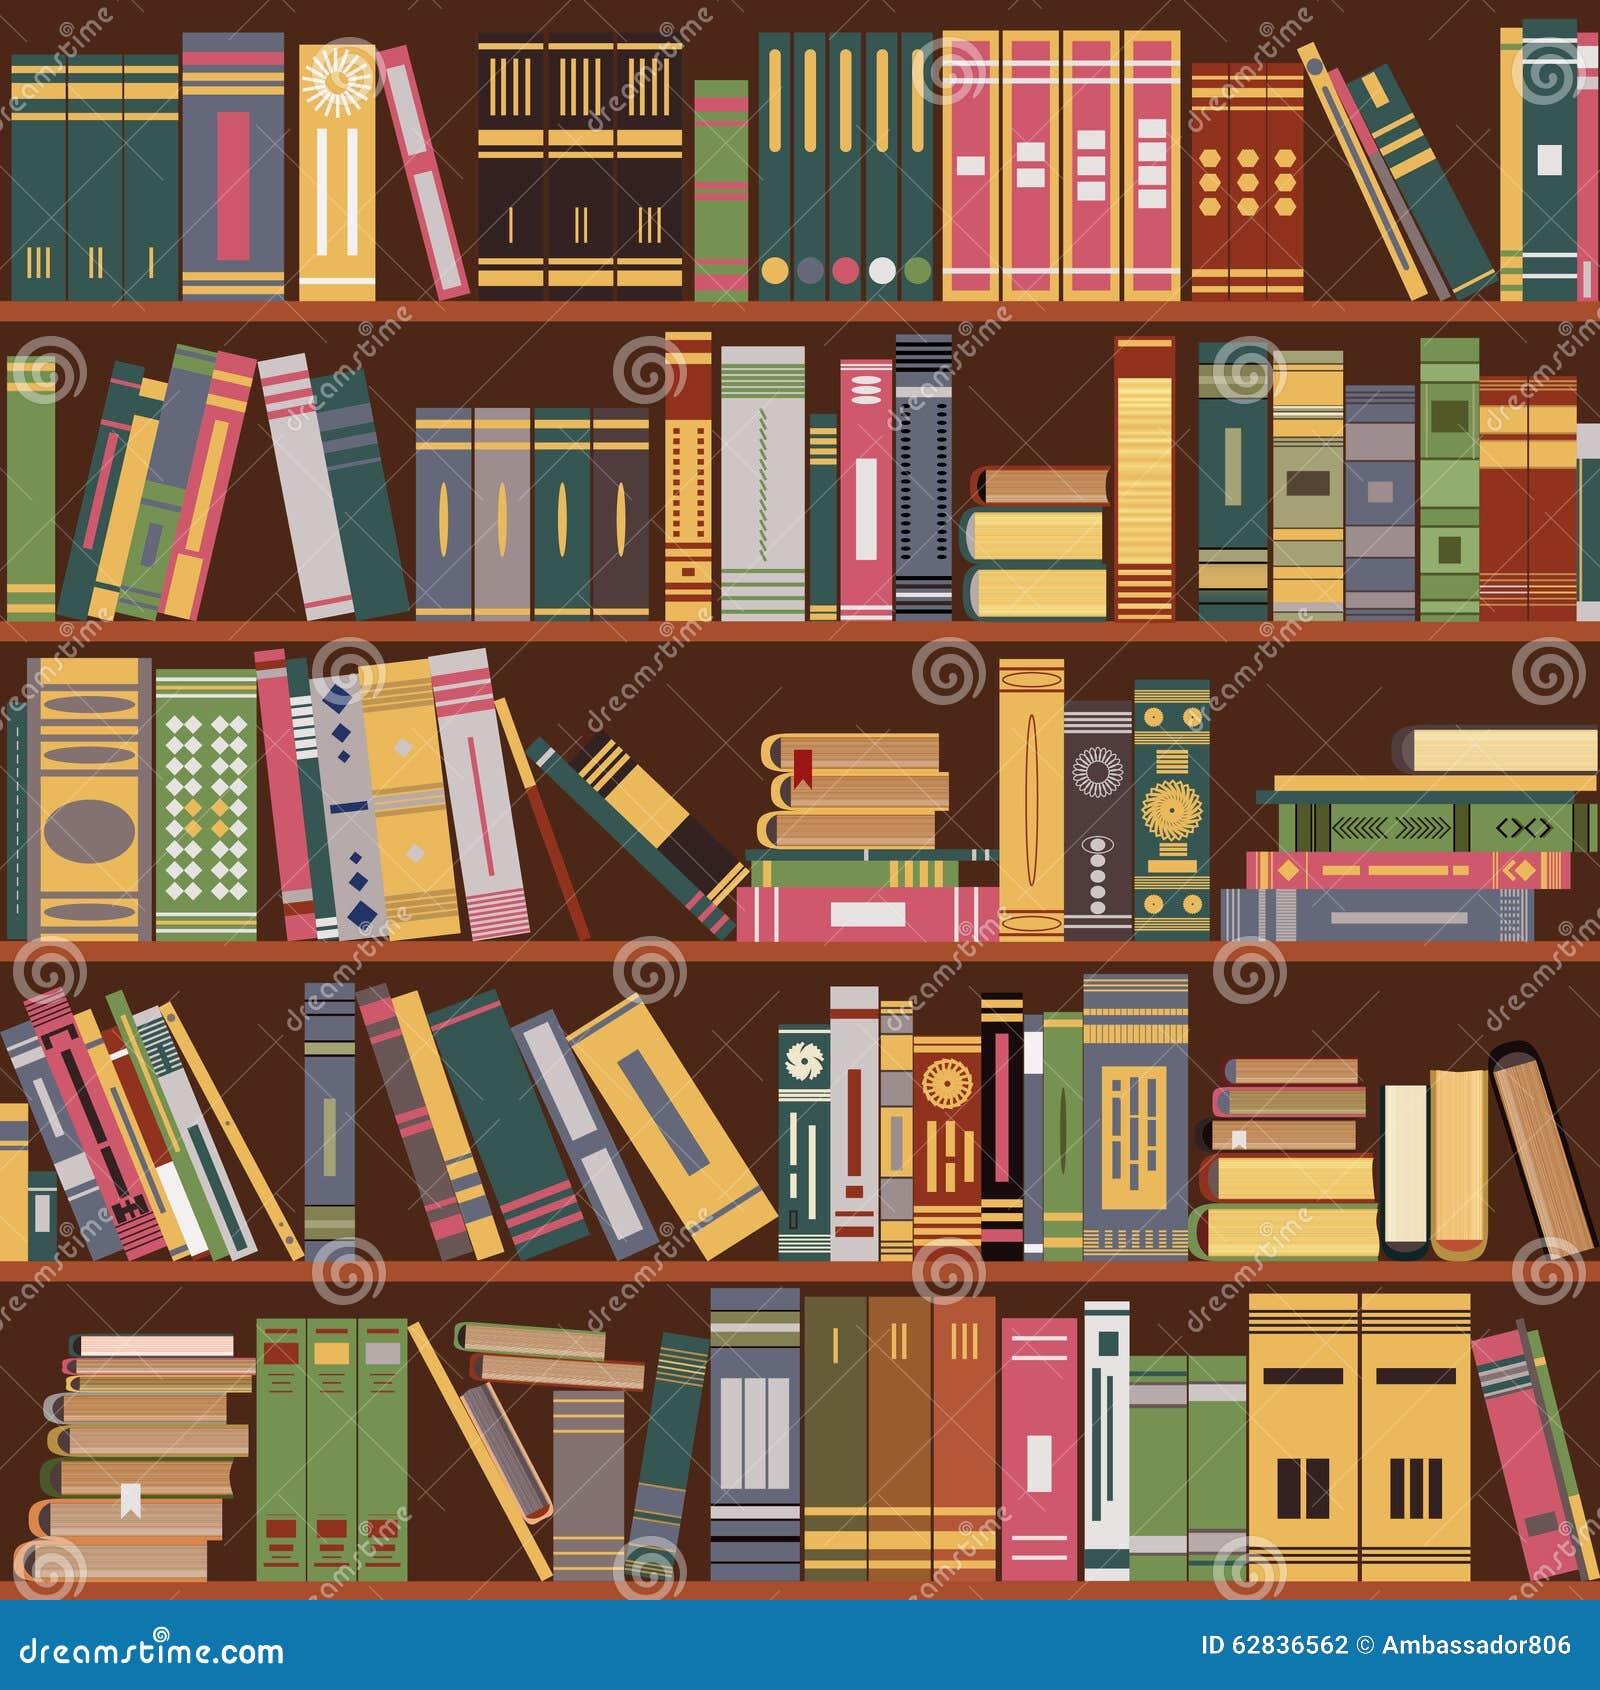 tag re livres biblioth que illustration stock illustration du d coration couleur 62836562. Black Bedroom Furniture Sets. Home Design Ideas